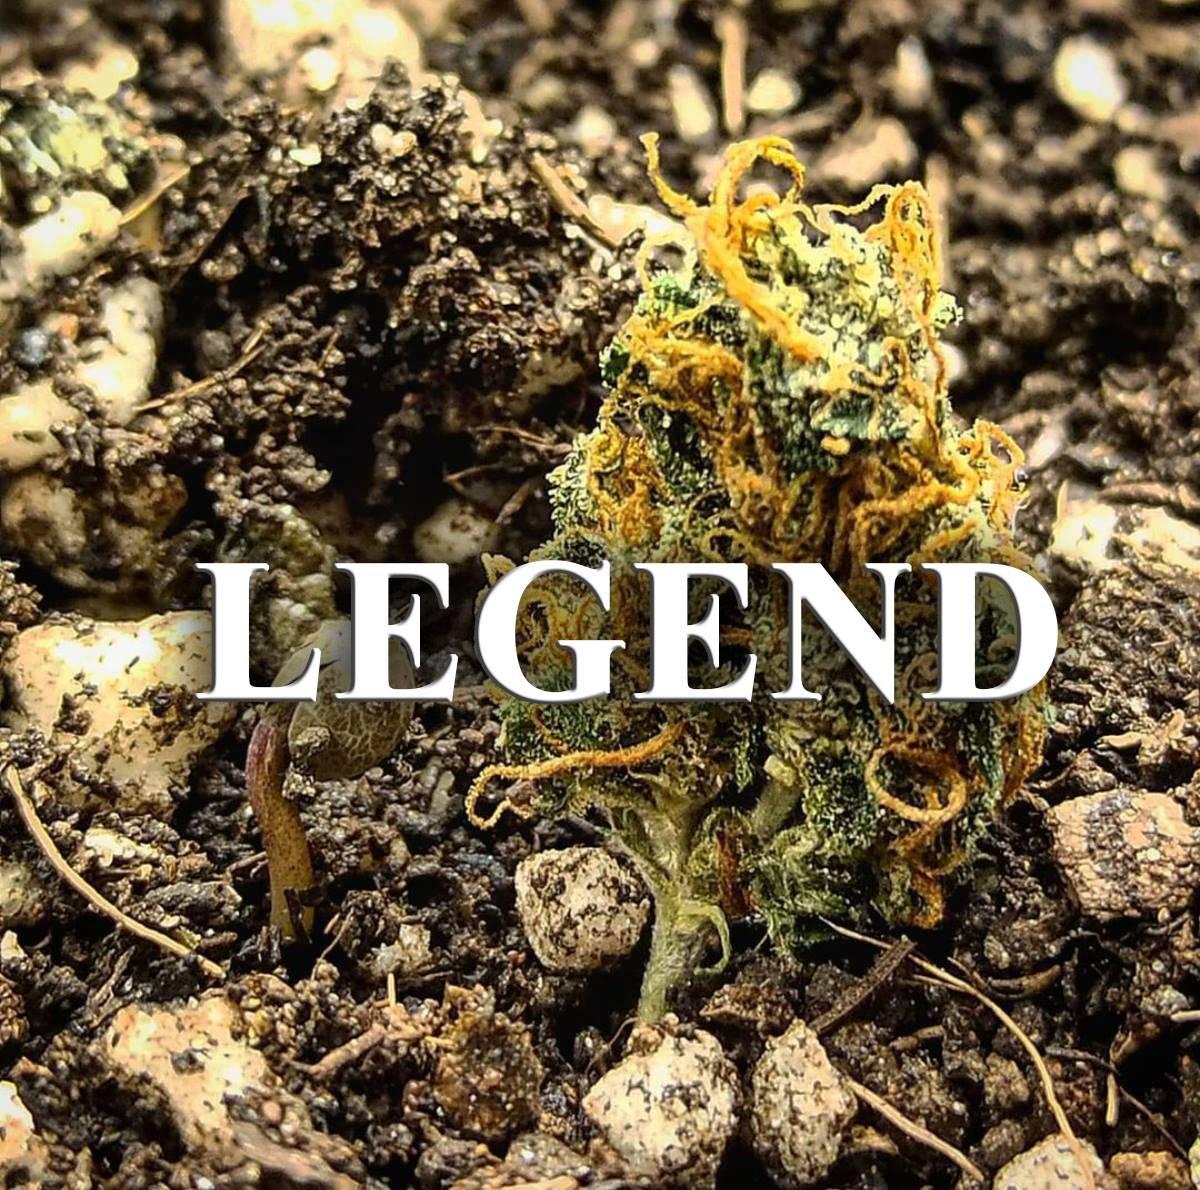 legendarne odmiany marihuany